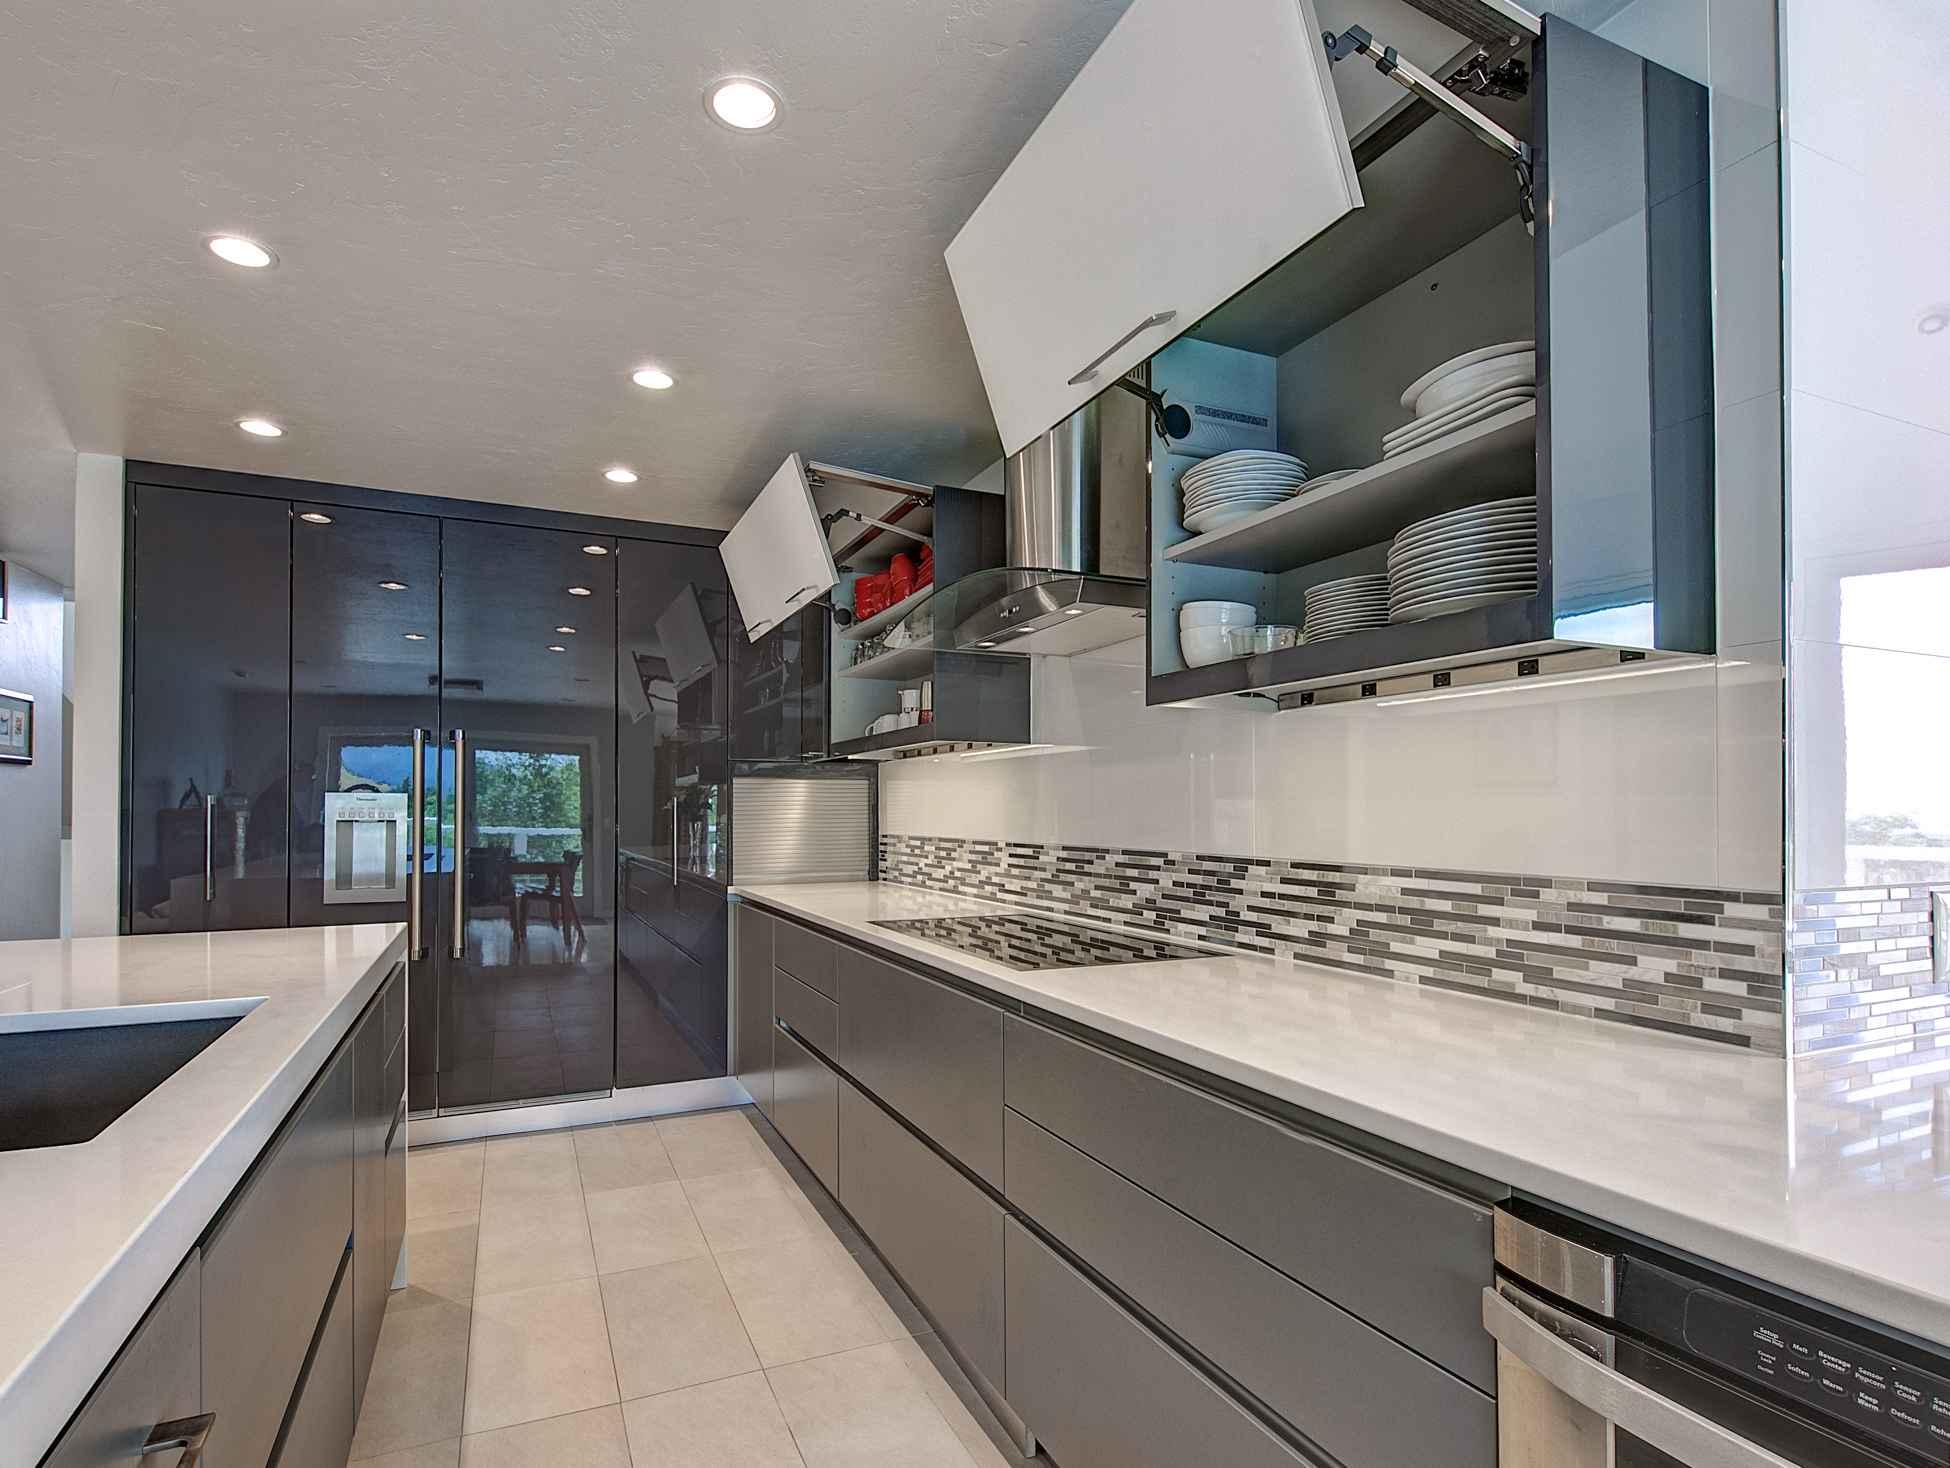 boulder modern — sanctuary kitchen and bath design-1.jpg